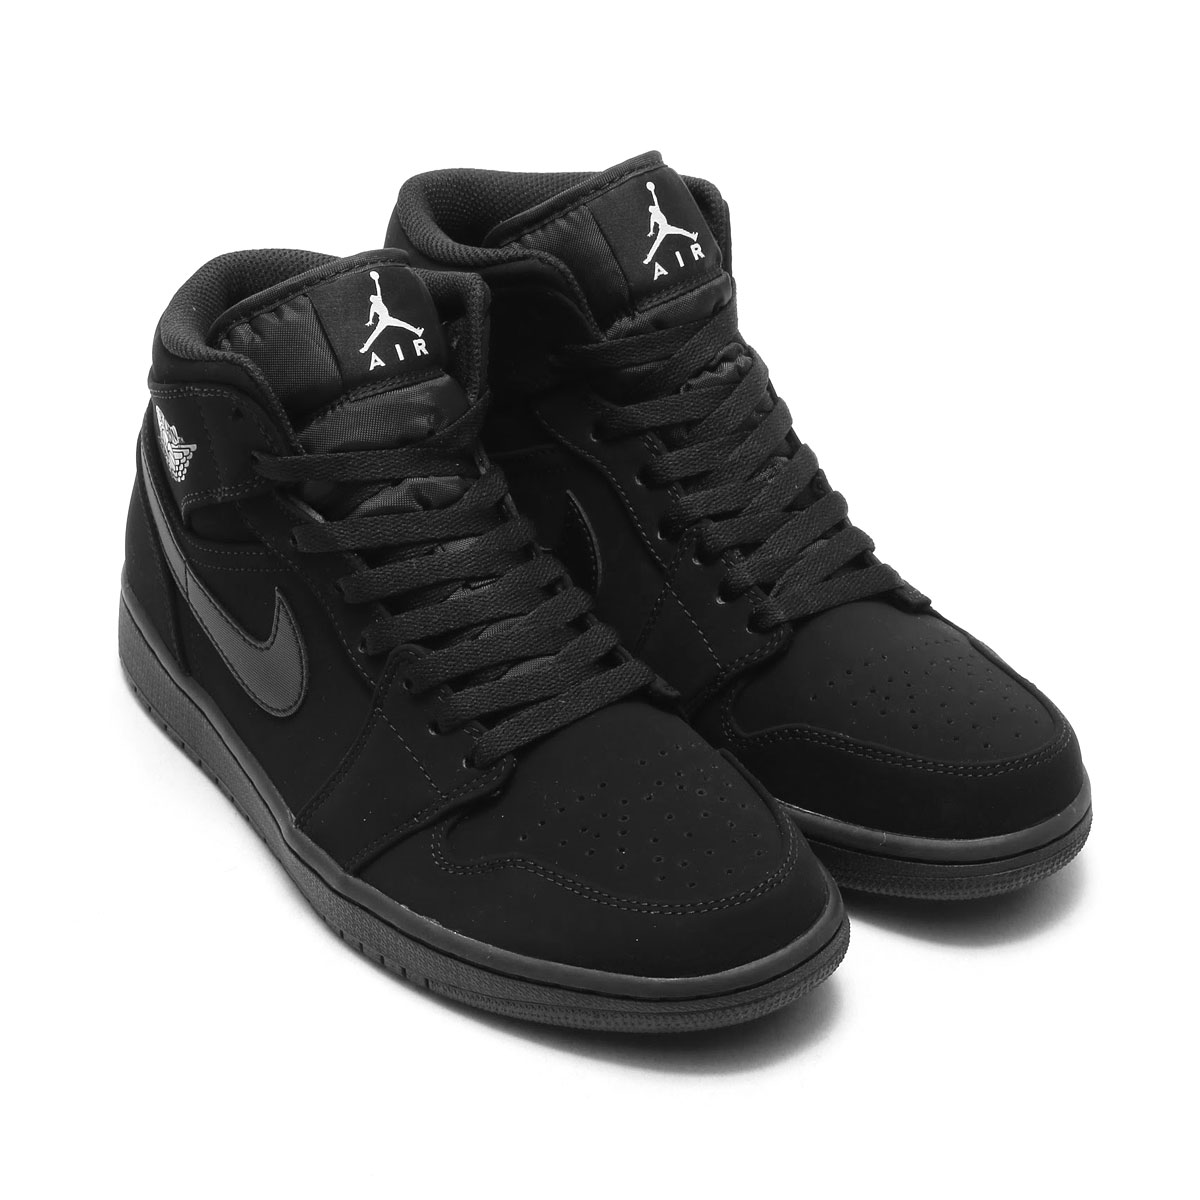 Jordan Shoes Singapore Store